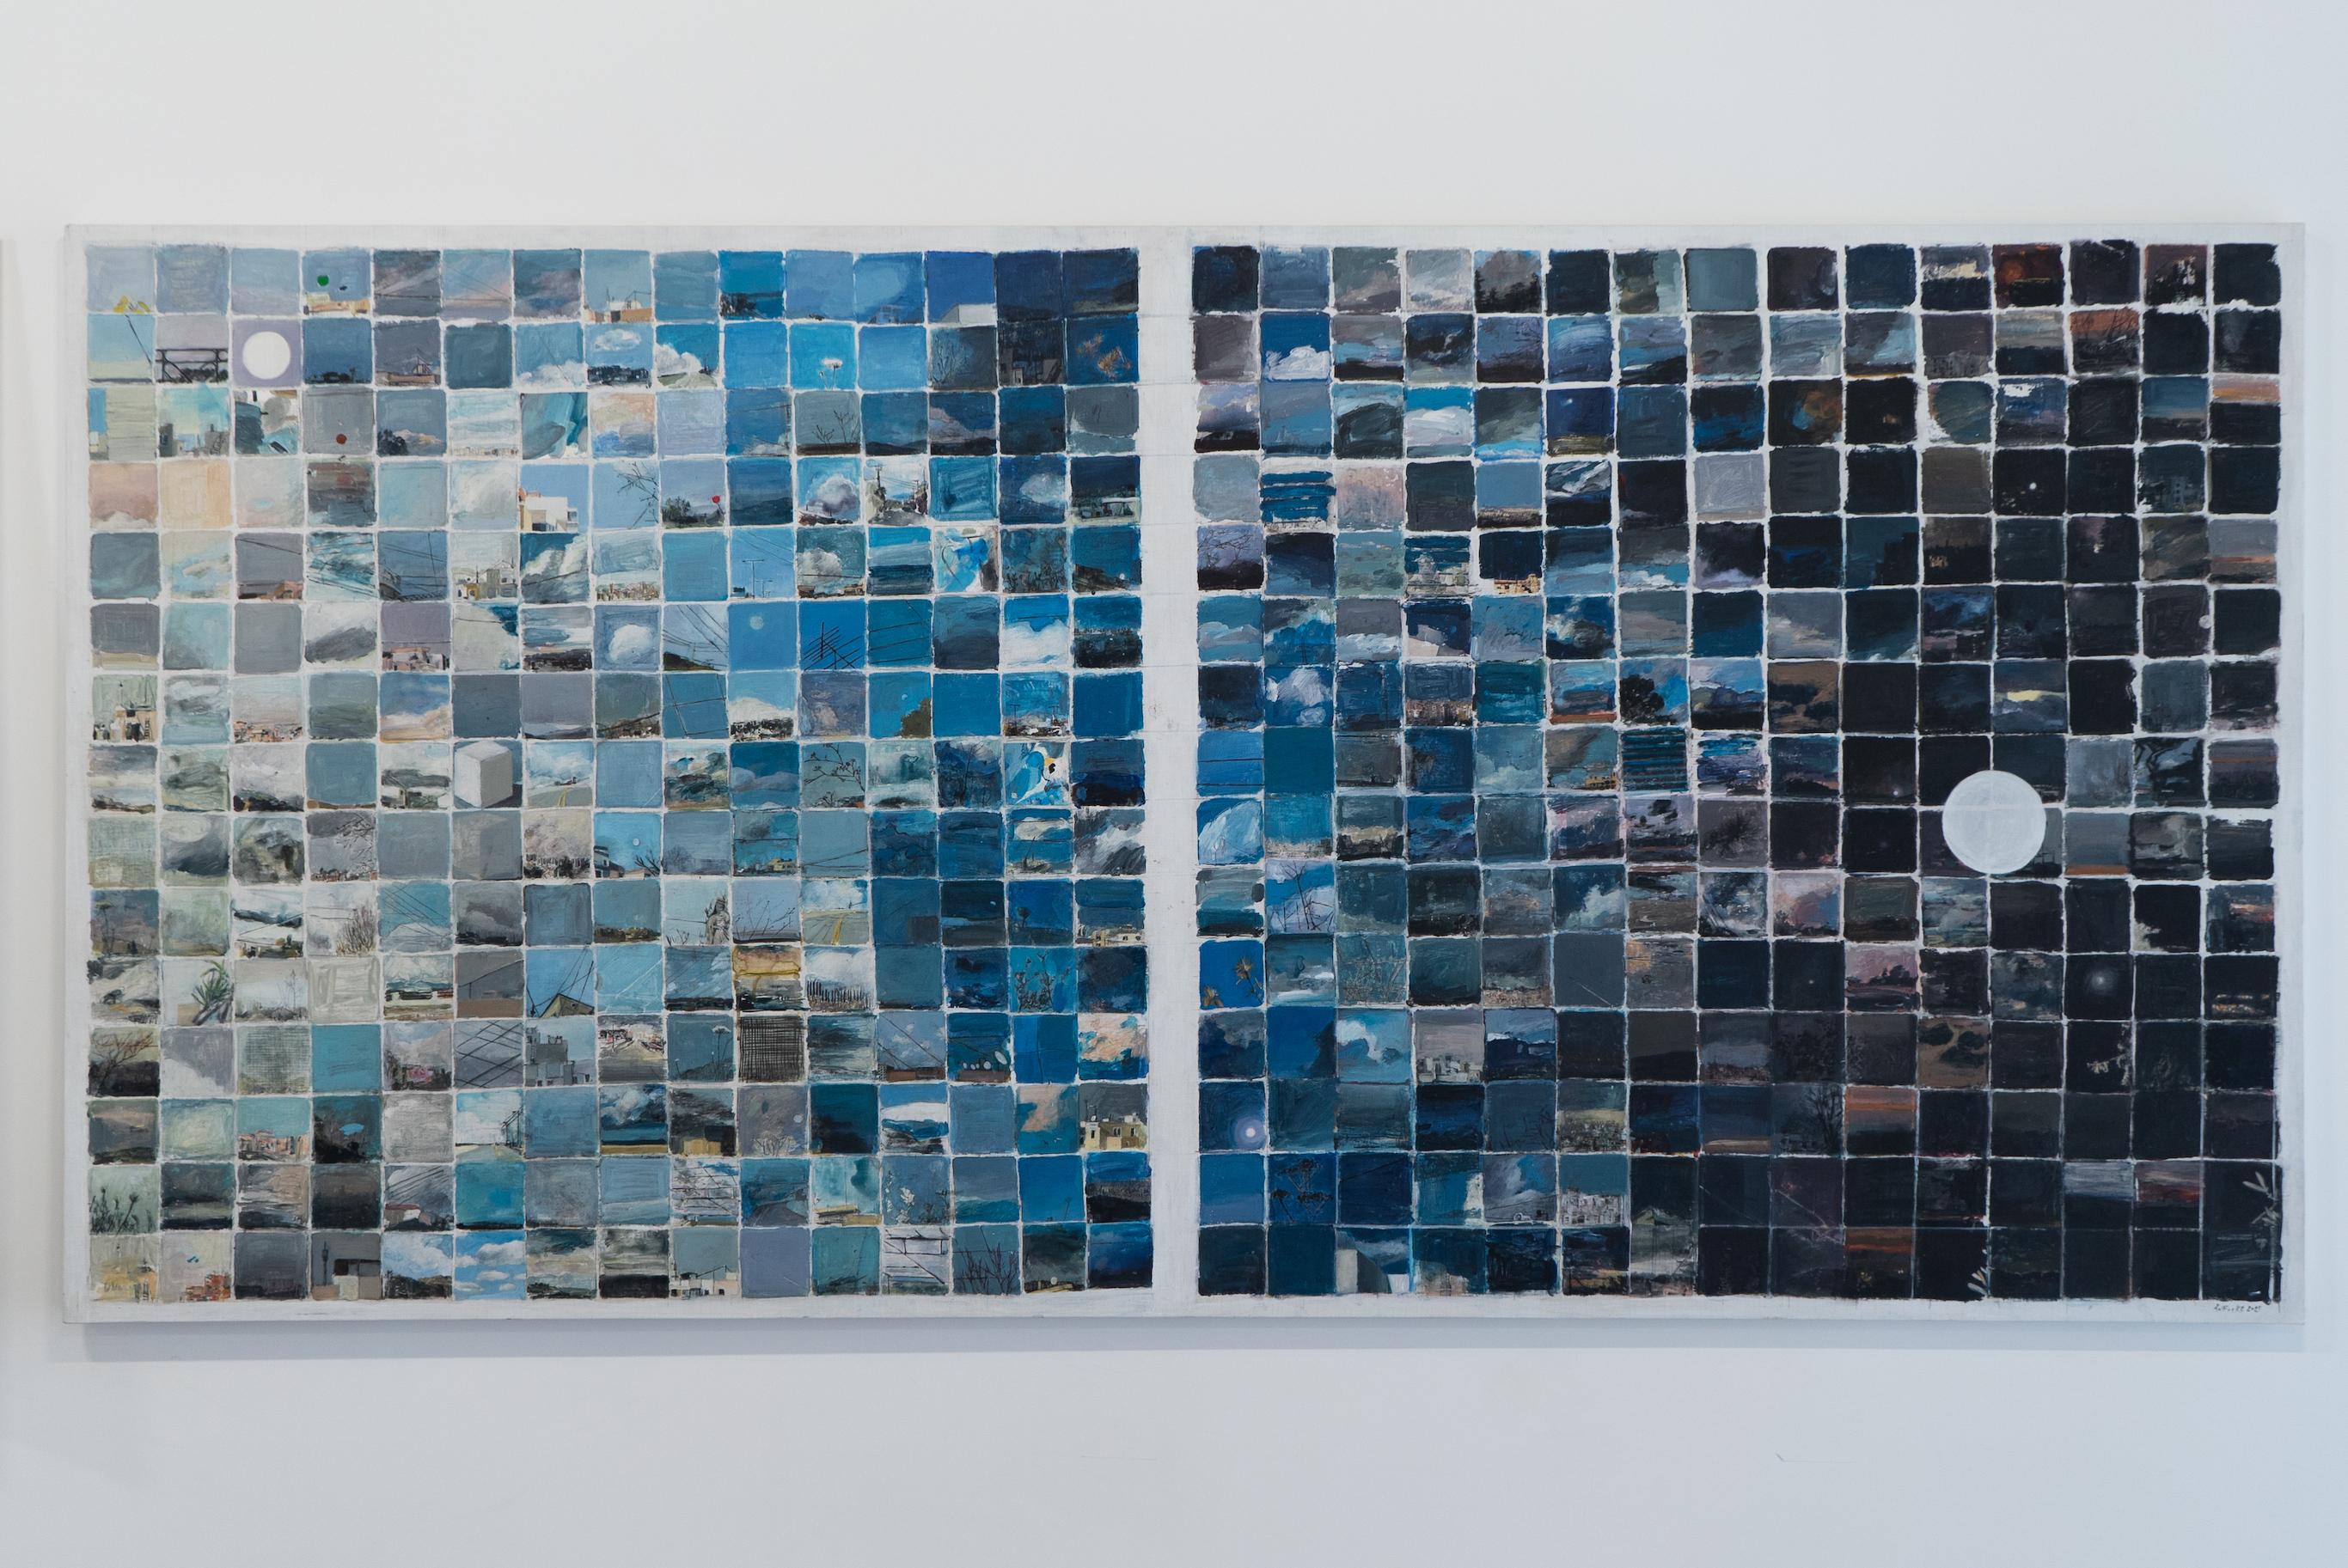 Bettina Khoury Badr, Sky Diary, 2021, Watercolor, mixed media on canvas, 107 x 214 cm © Dimitri Nassar, Courtesy of Galerie Tanit